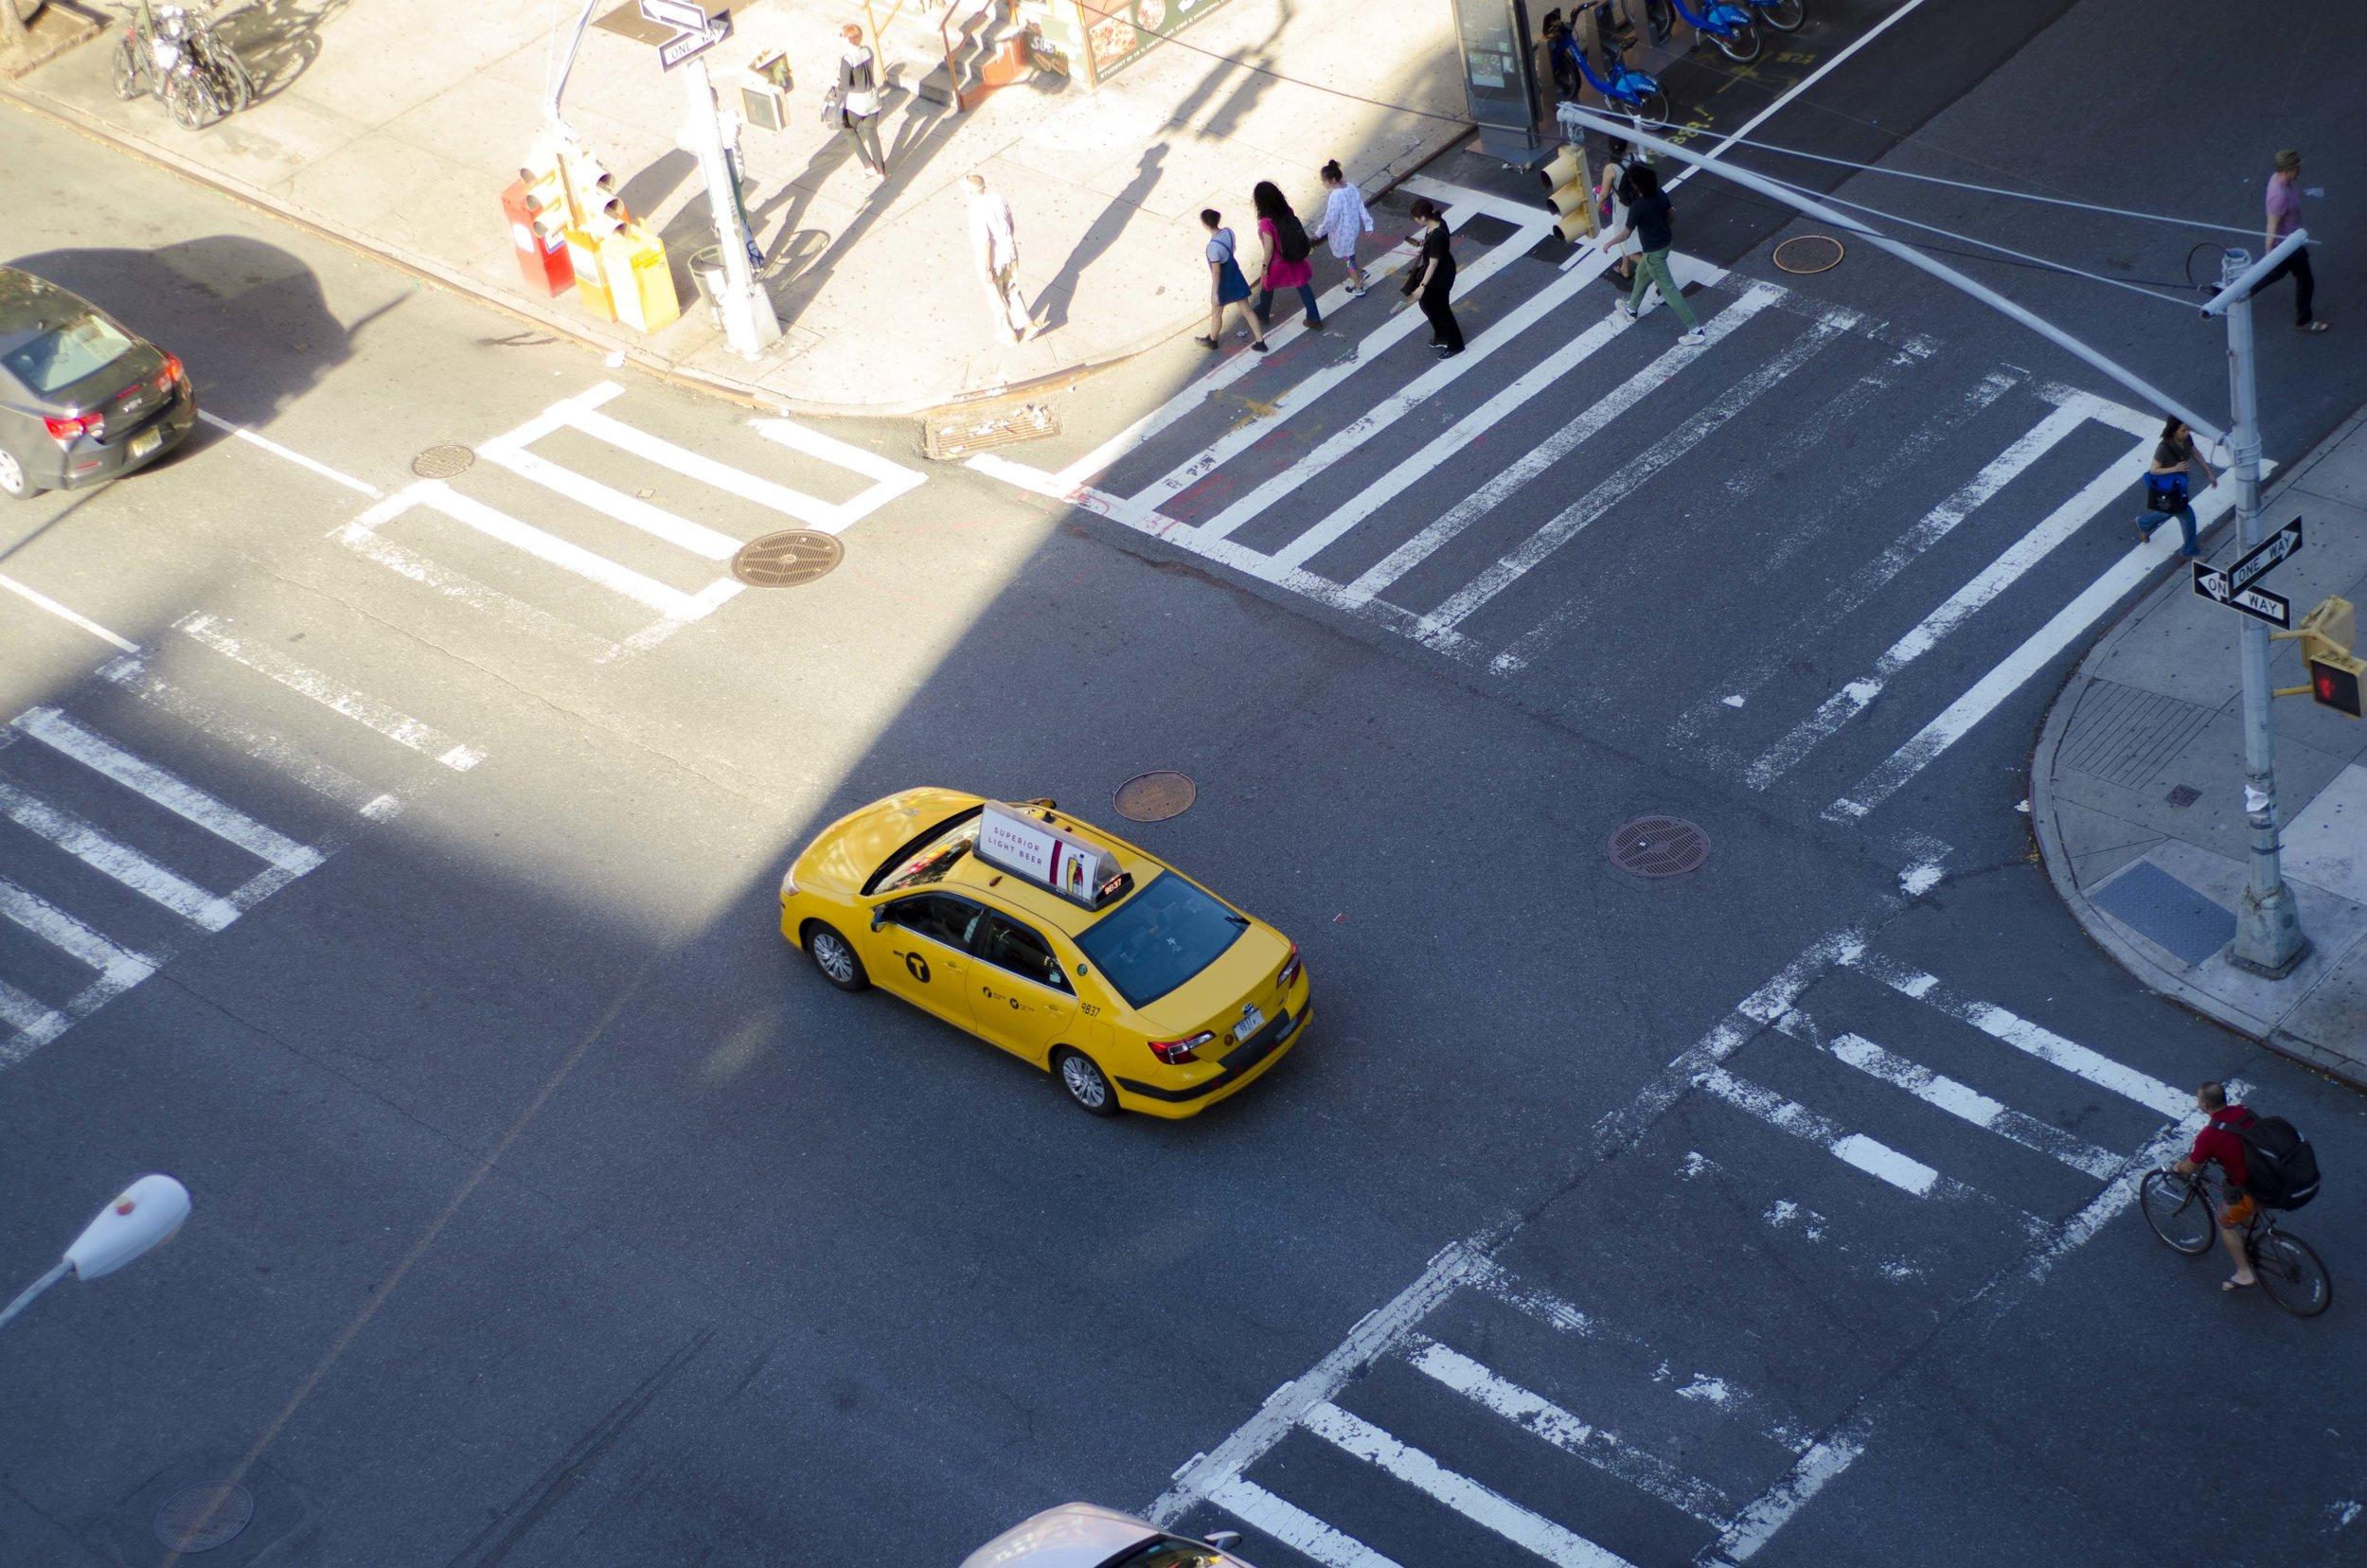 NYC_29.jpg